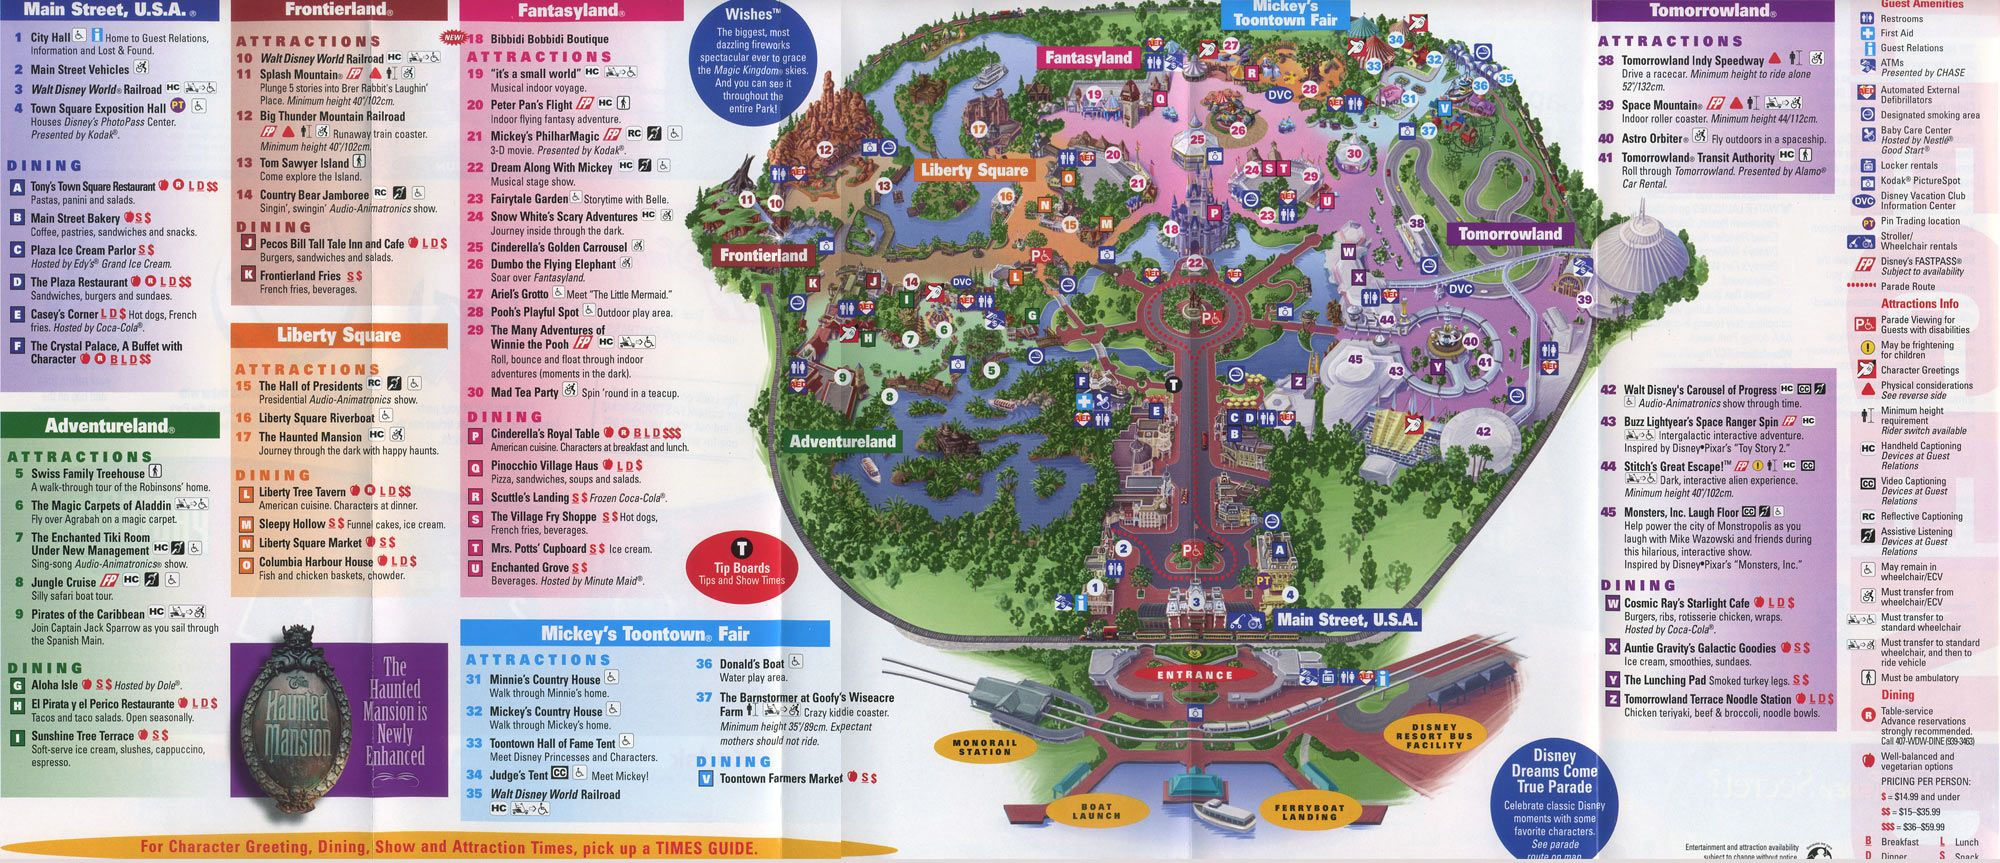 Disneyworld map walt disney world maps travel theme parks disneyworld map walt disney world maps gumiabroncs Image collections